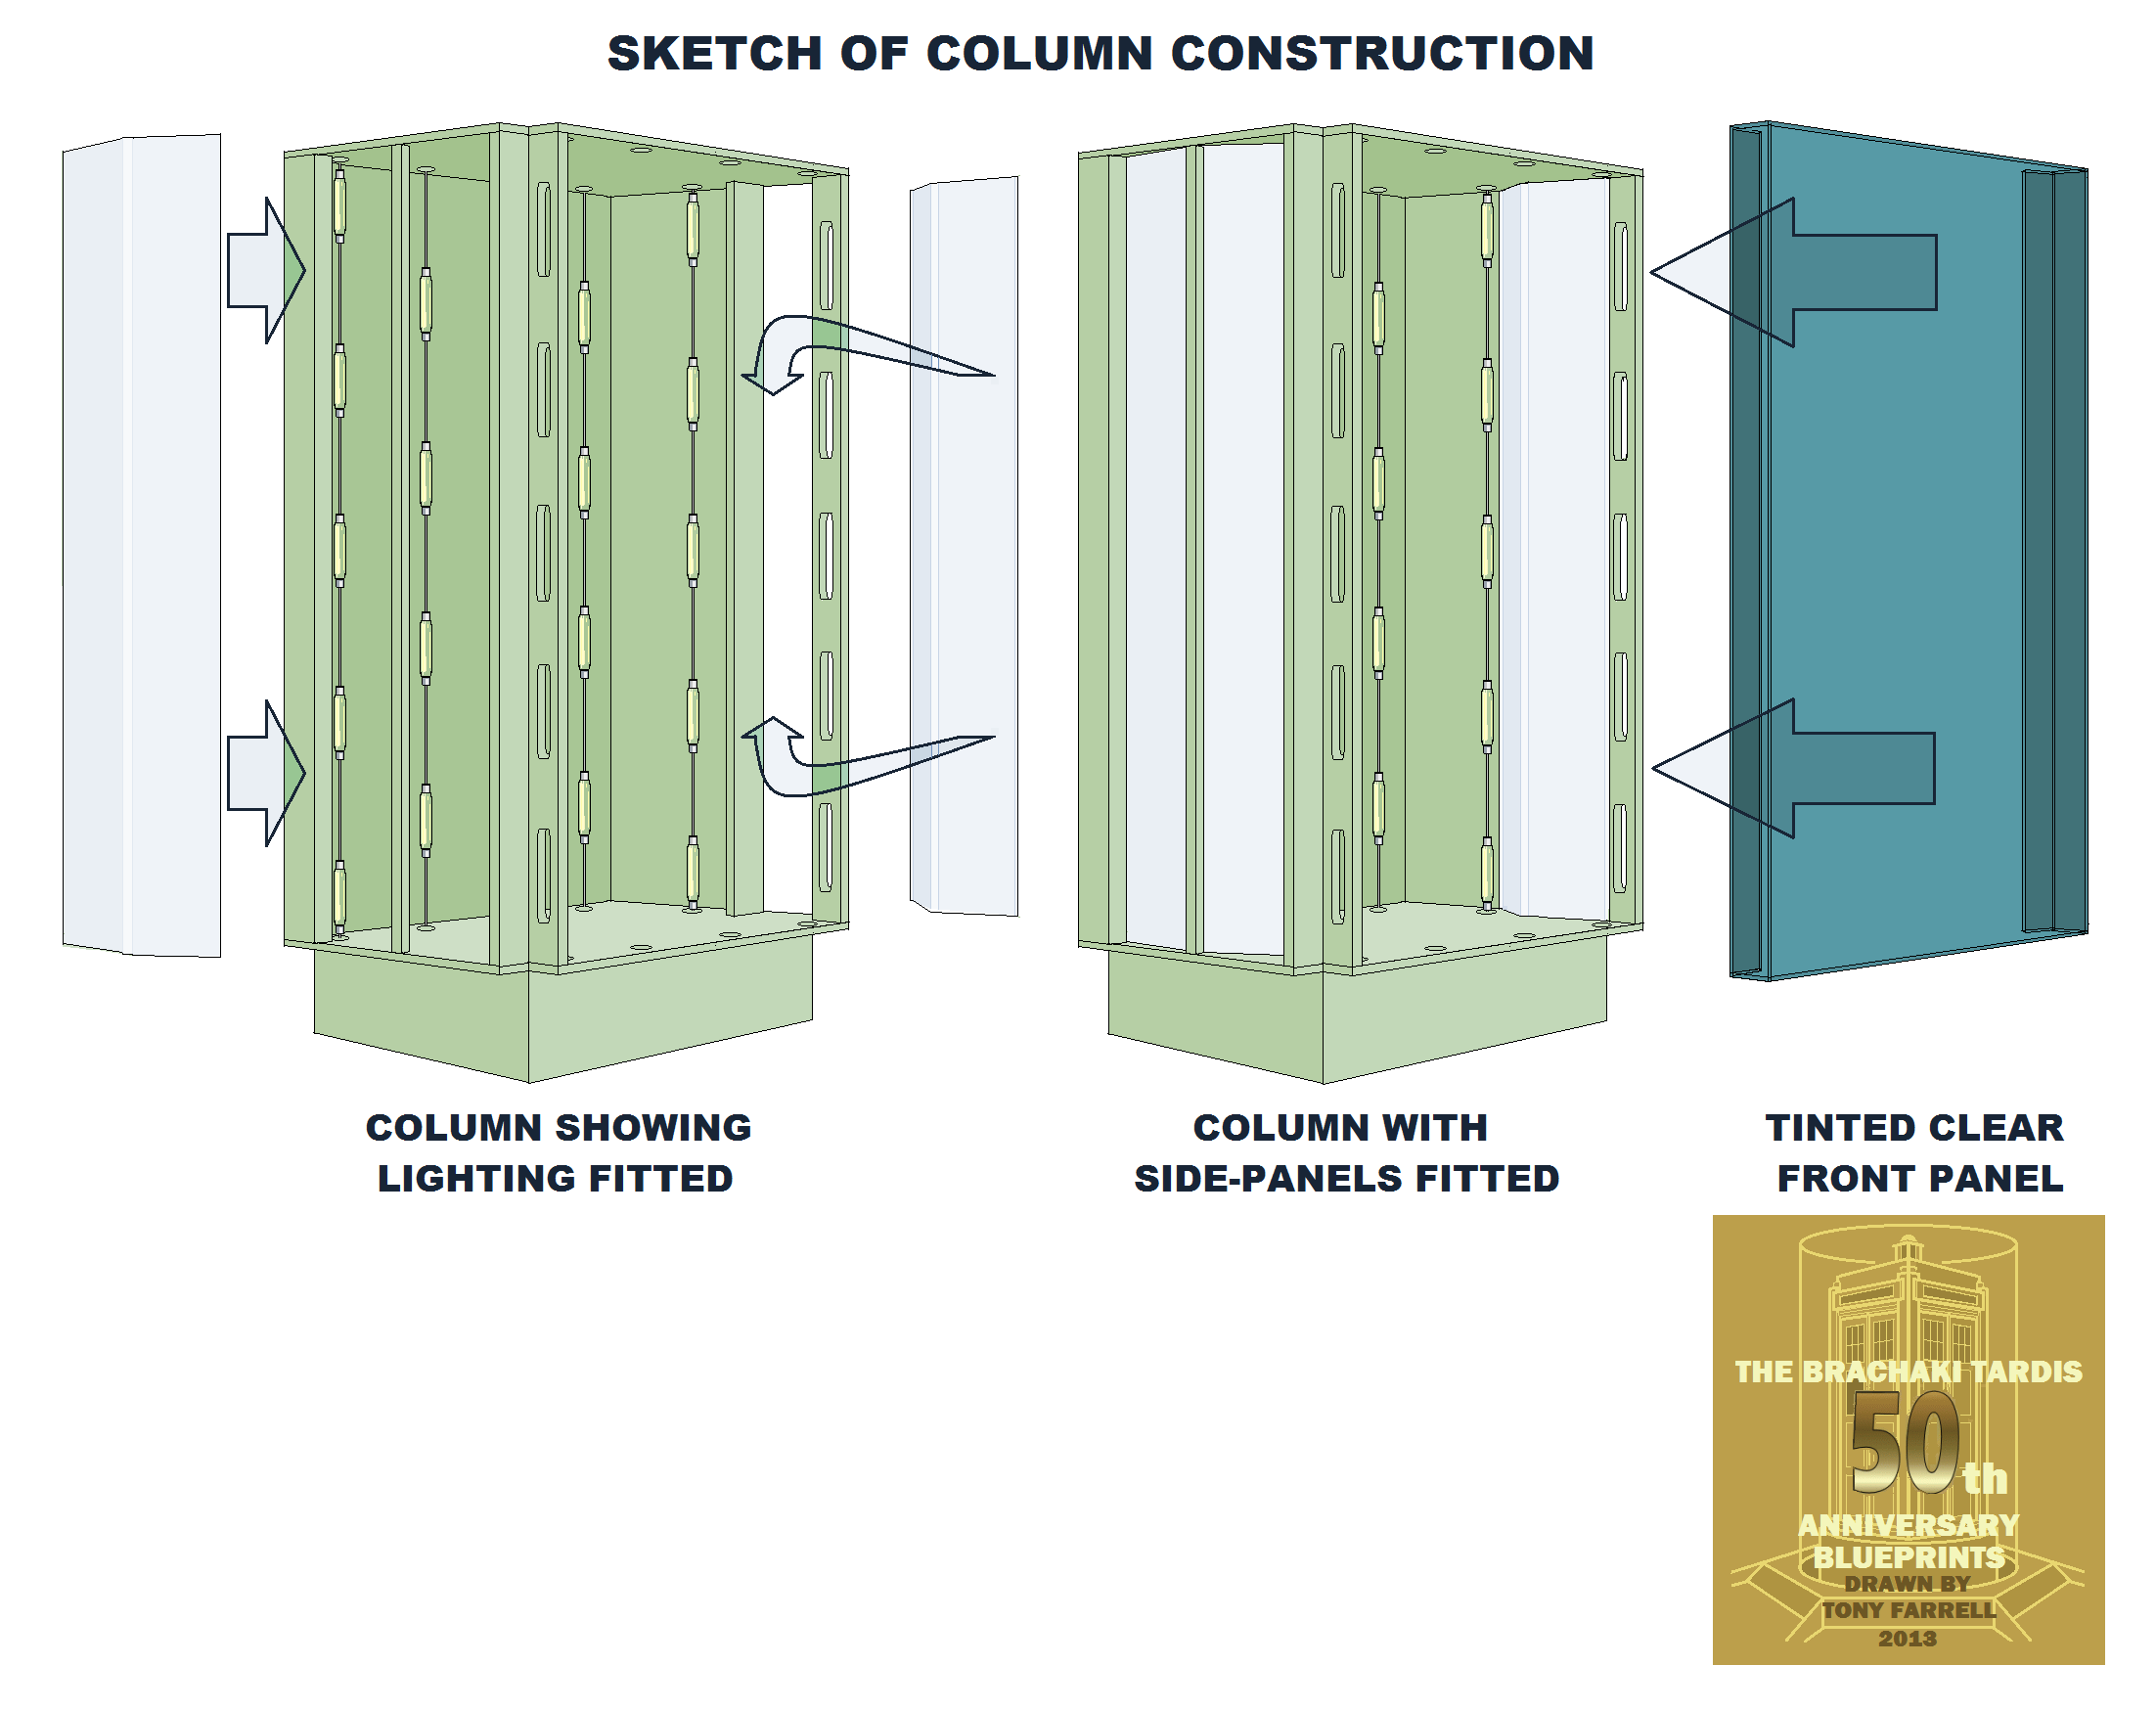 column sketch2.png